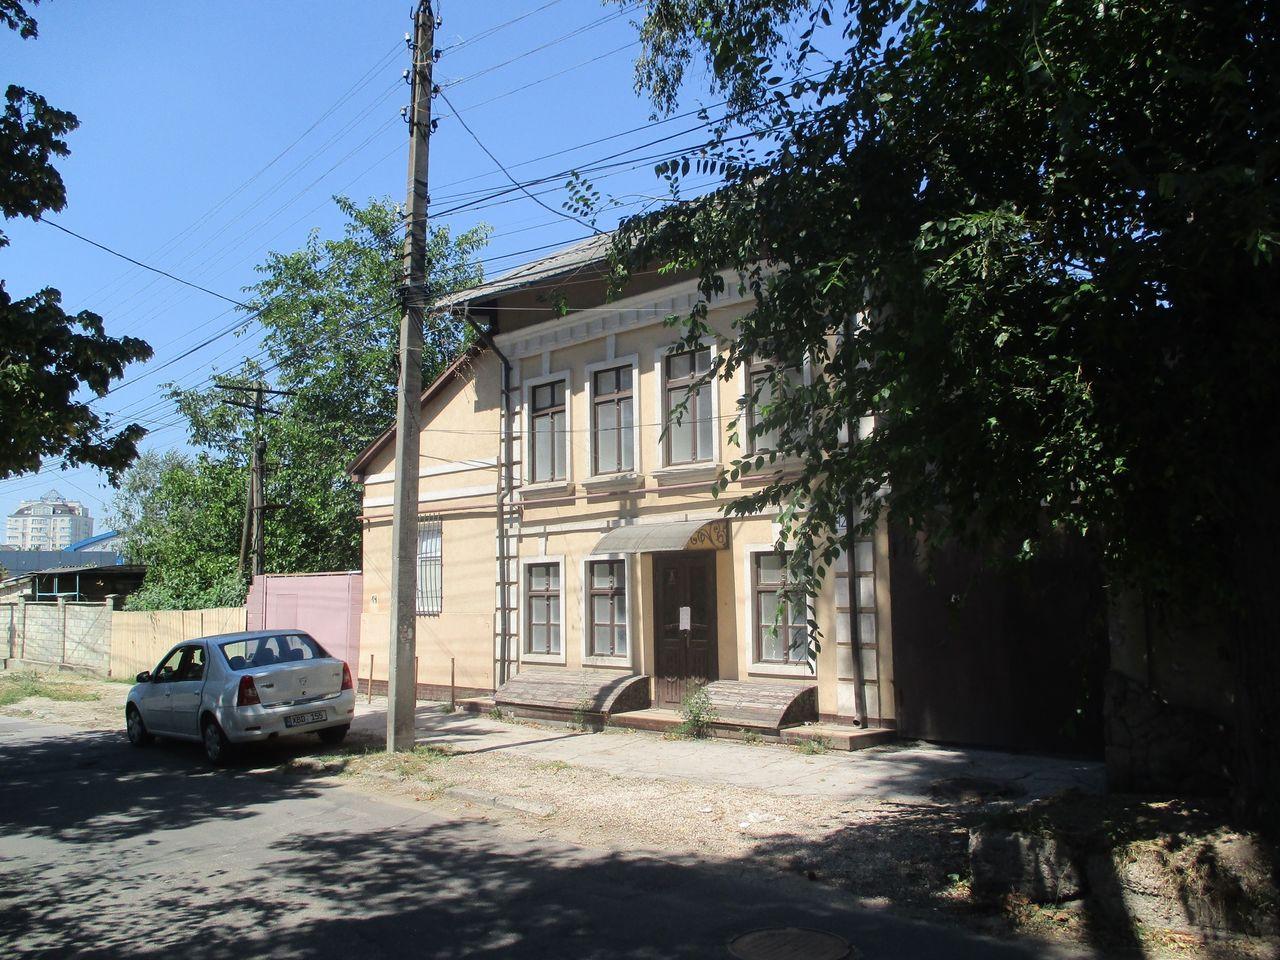 Banca vinde casa oficiu in centru for Banca in casa